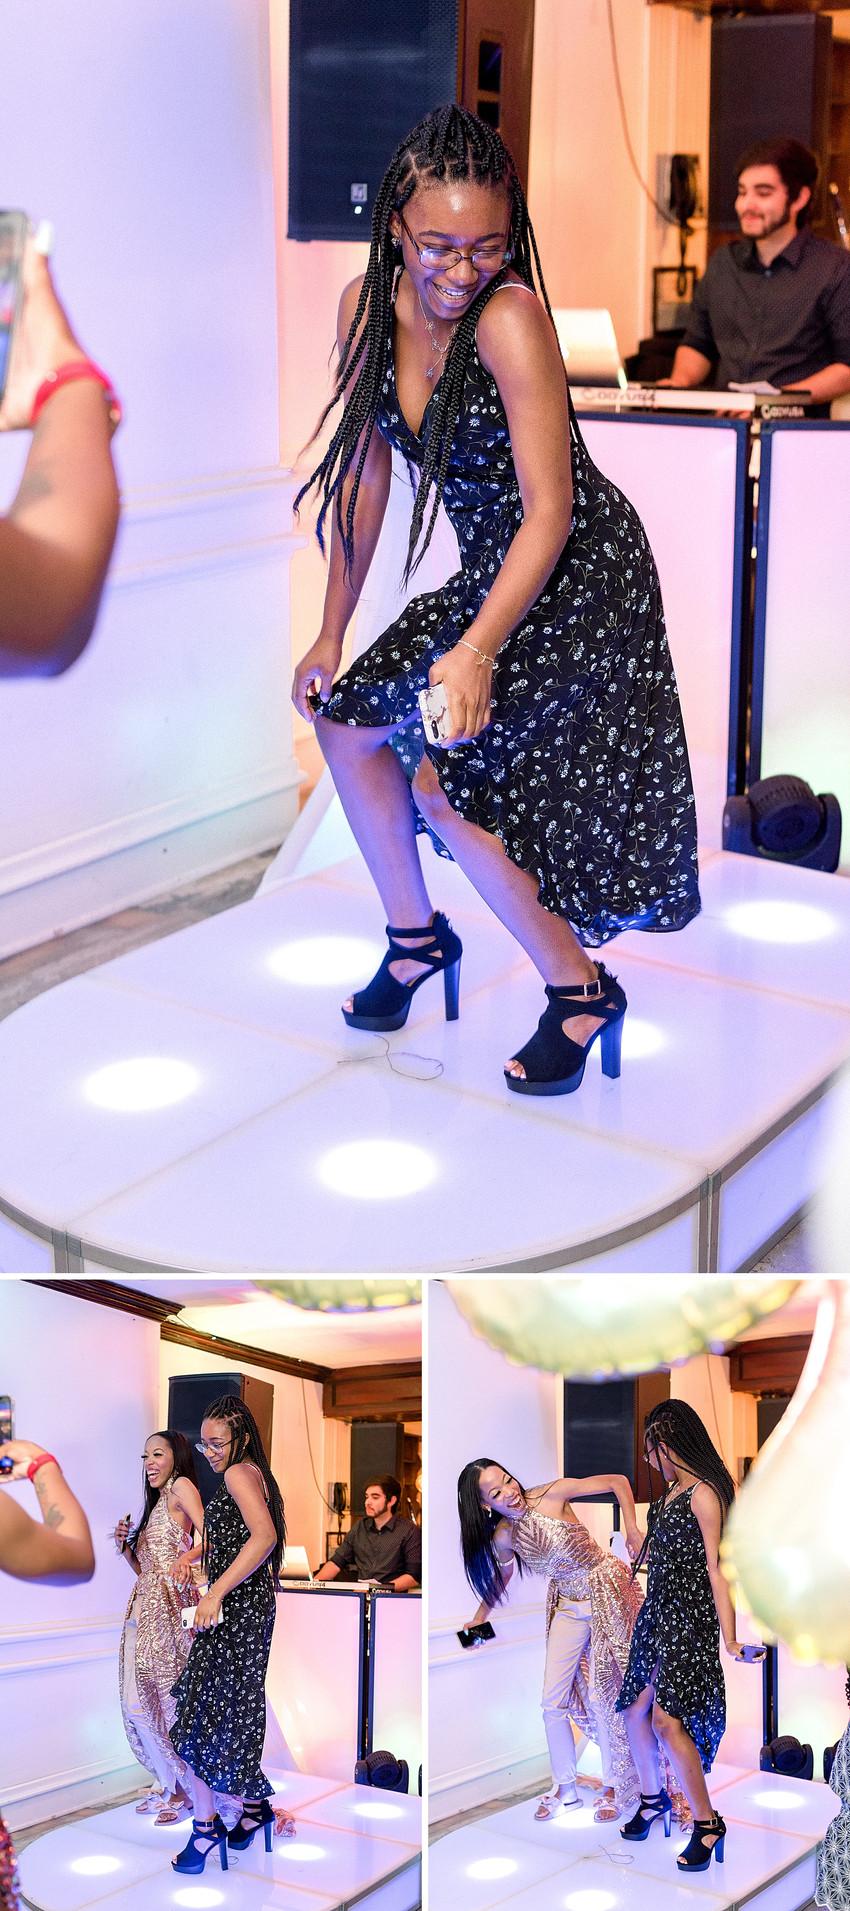 Girl dancing on a dance floor partying in New York